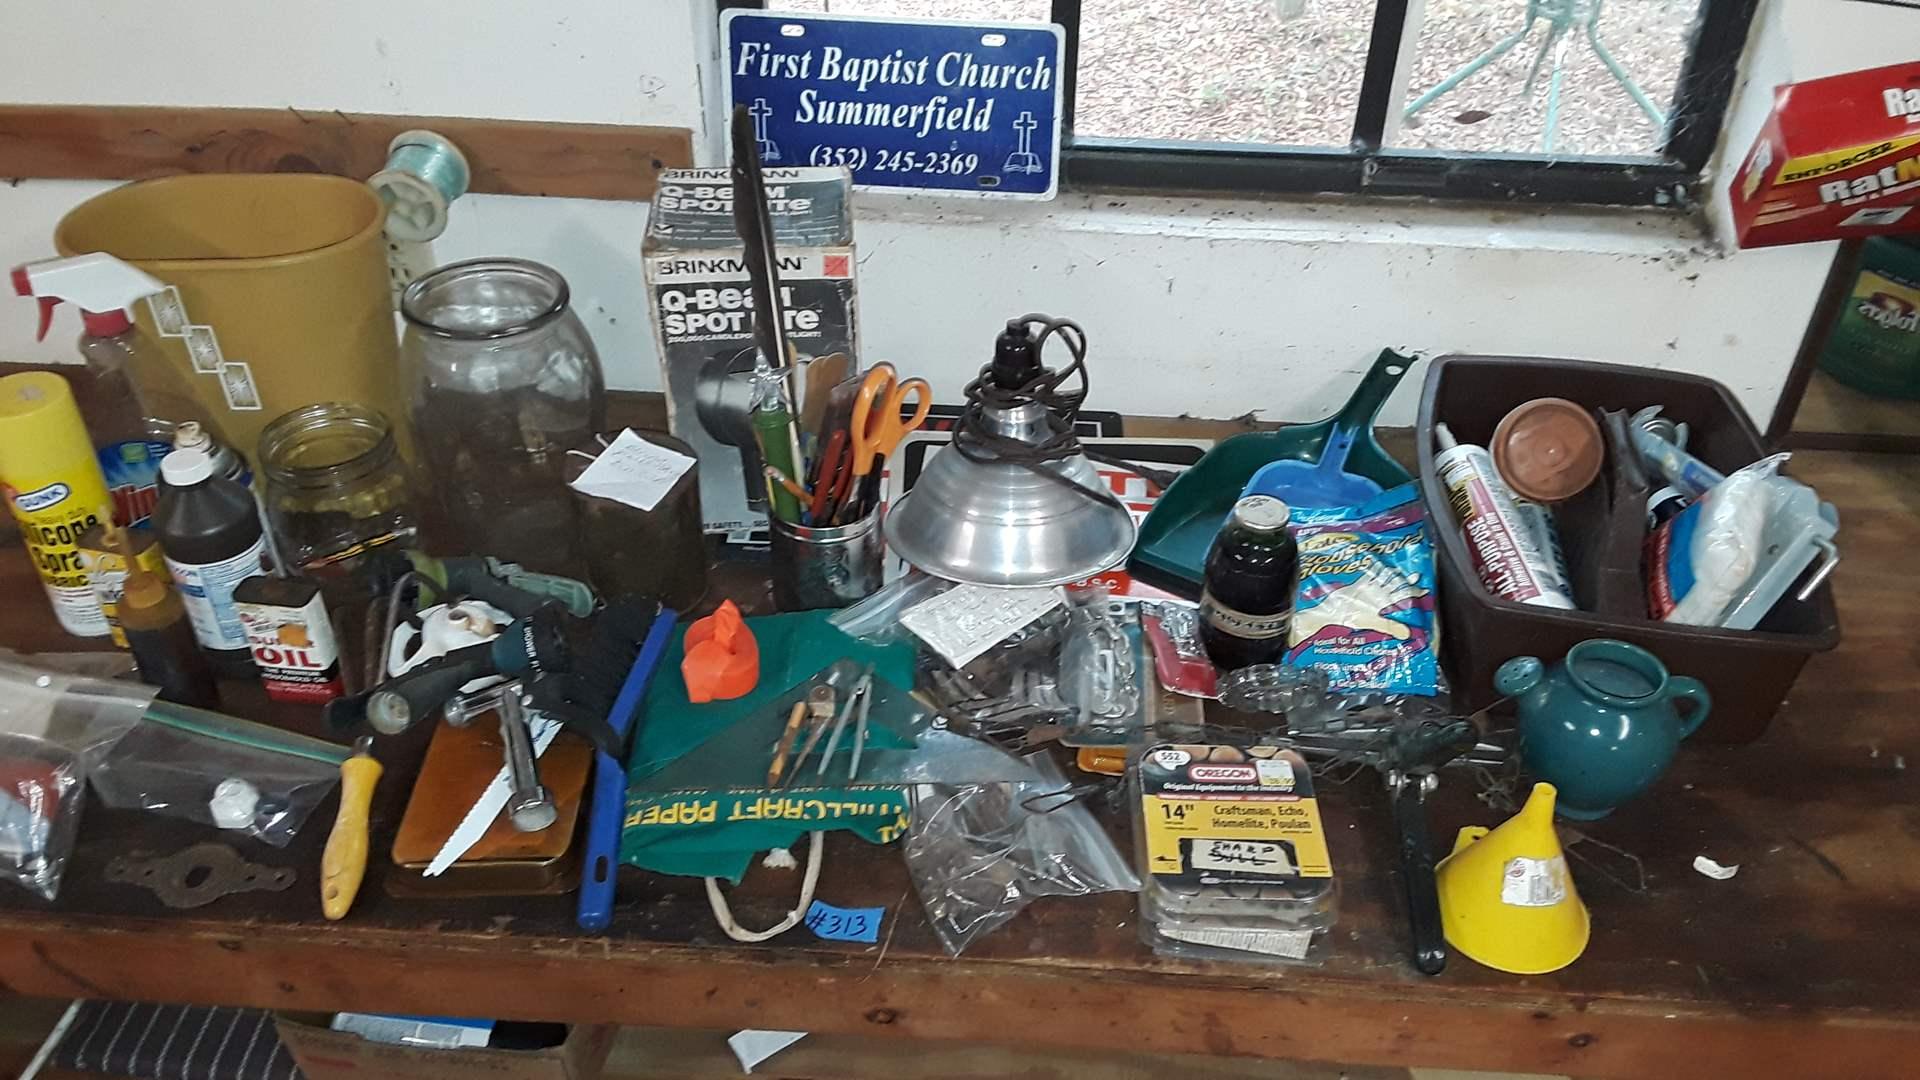 Lot # 313 GARAGE ITEMS, Q BEAM SPOTLIGHT, PATCHES , MISCELLANEOUS